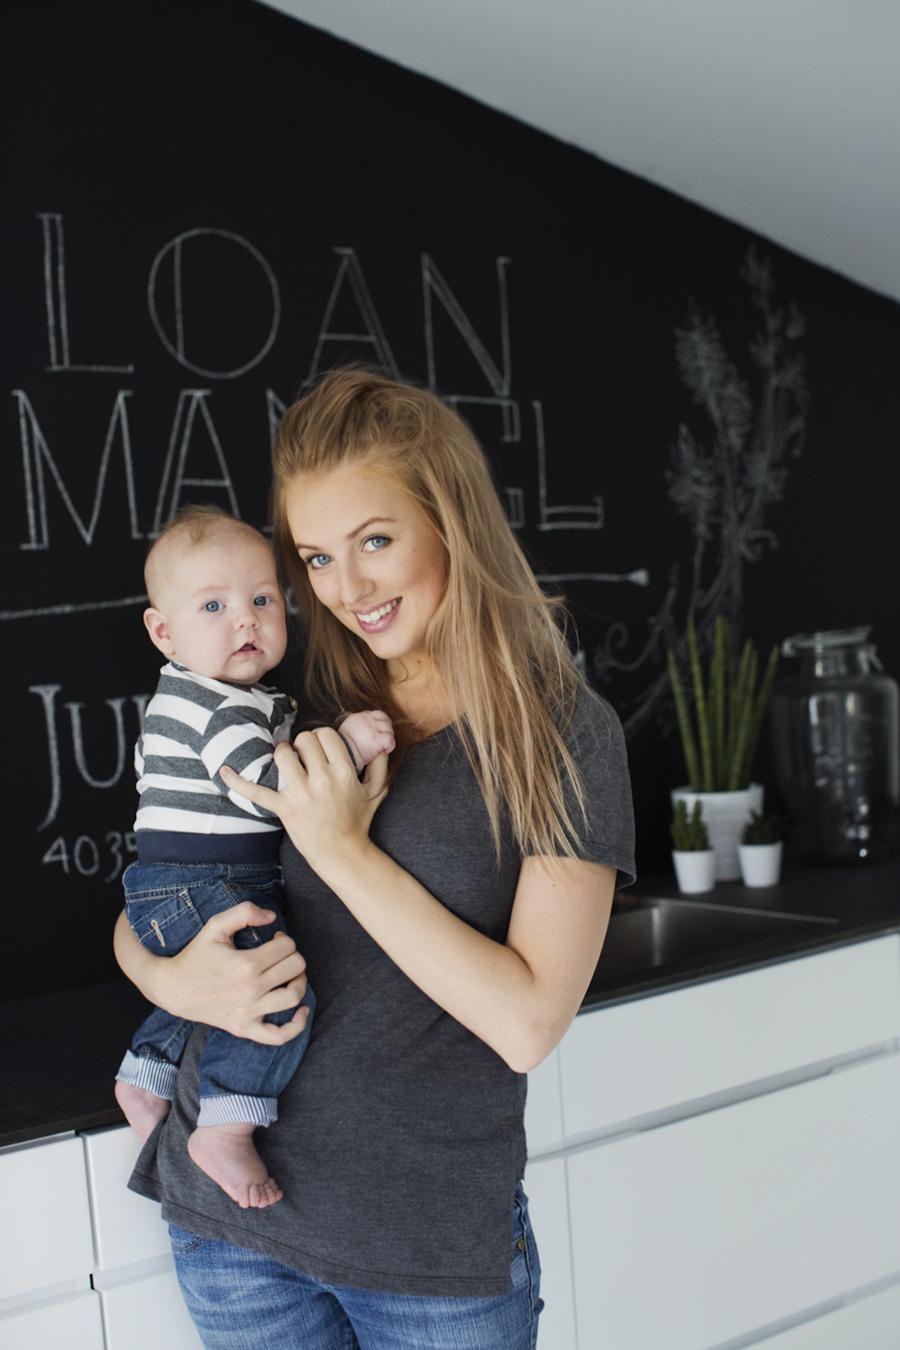 loan-emanuel-baby-barseltreff-november-mammablogg-2015-2014_03